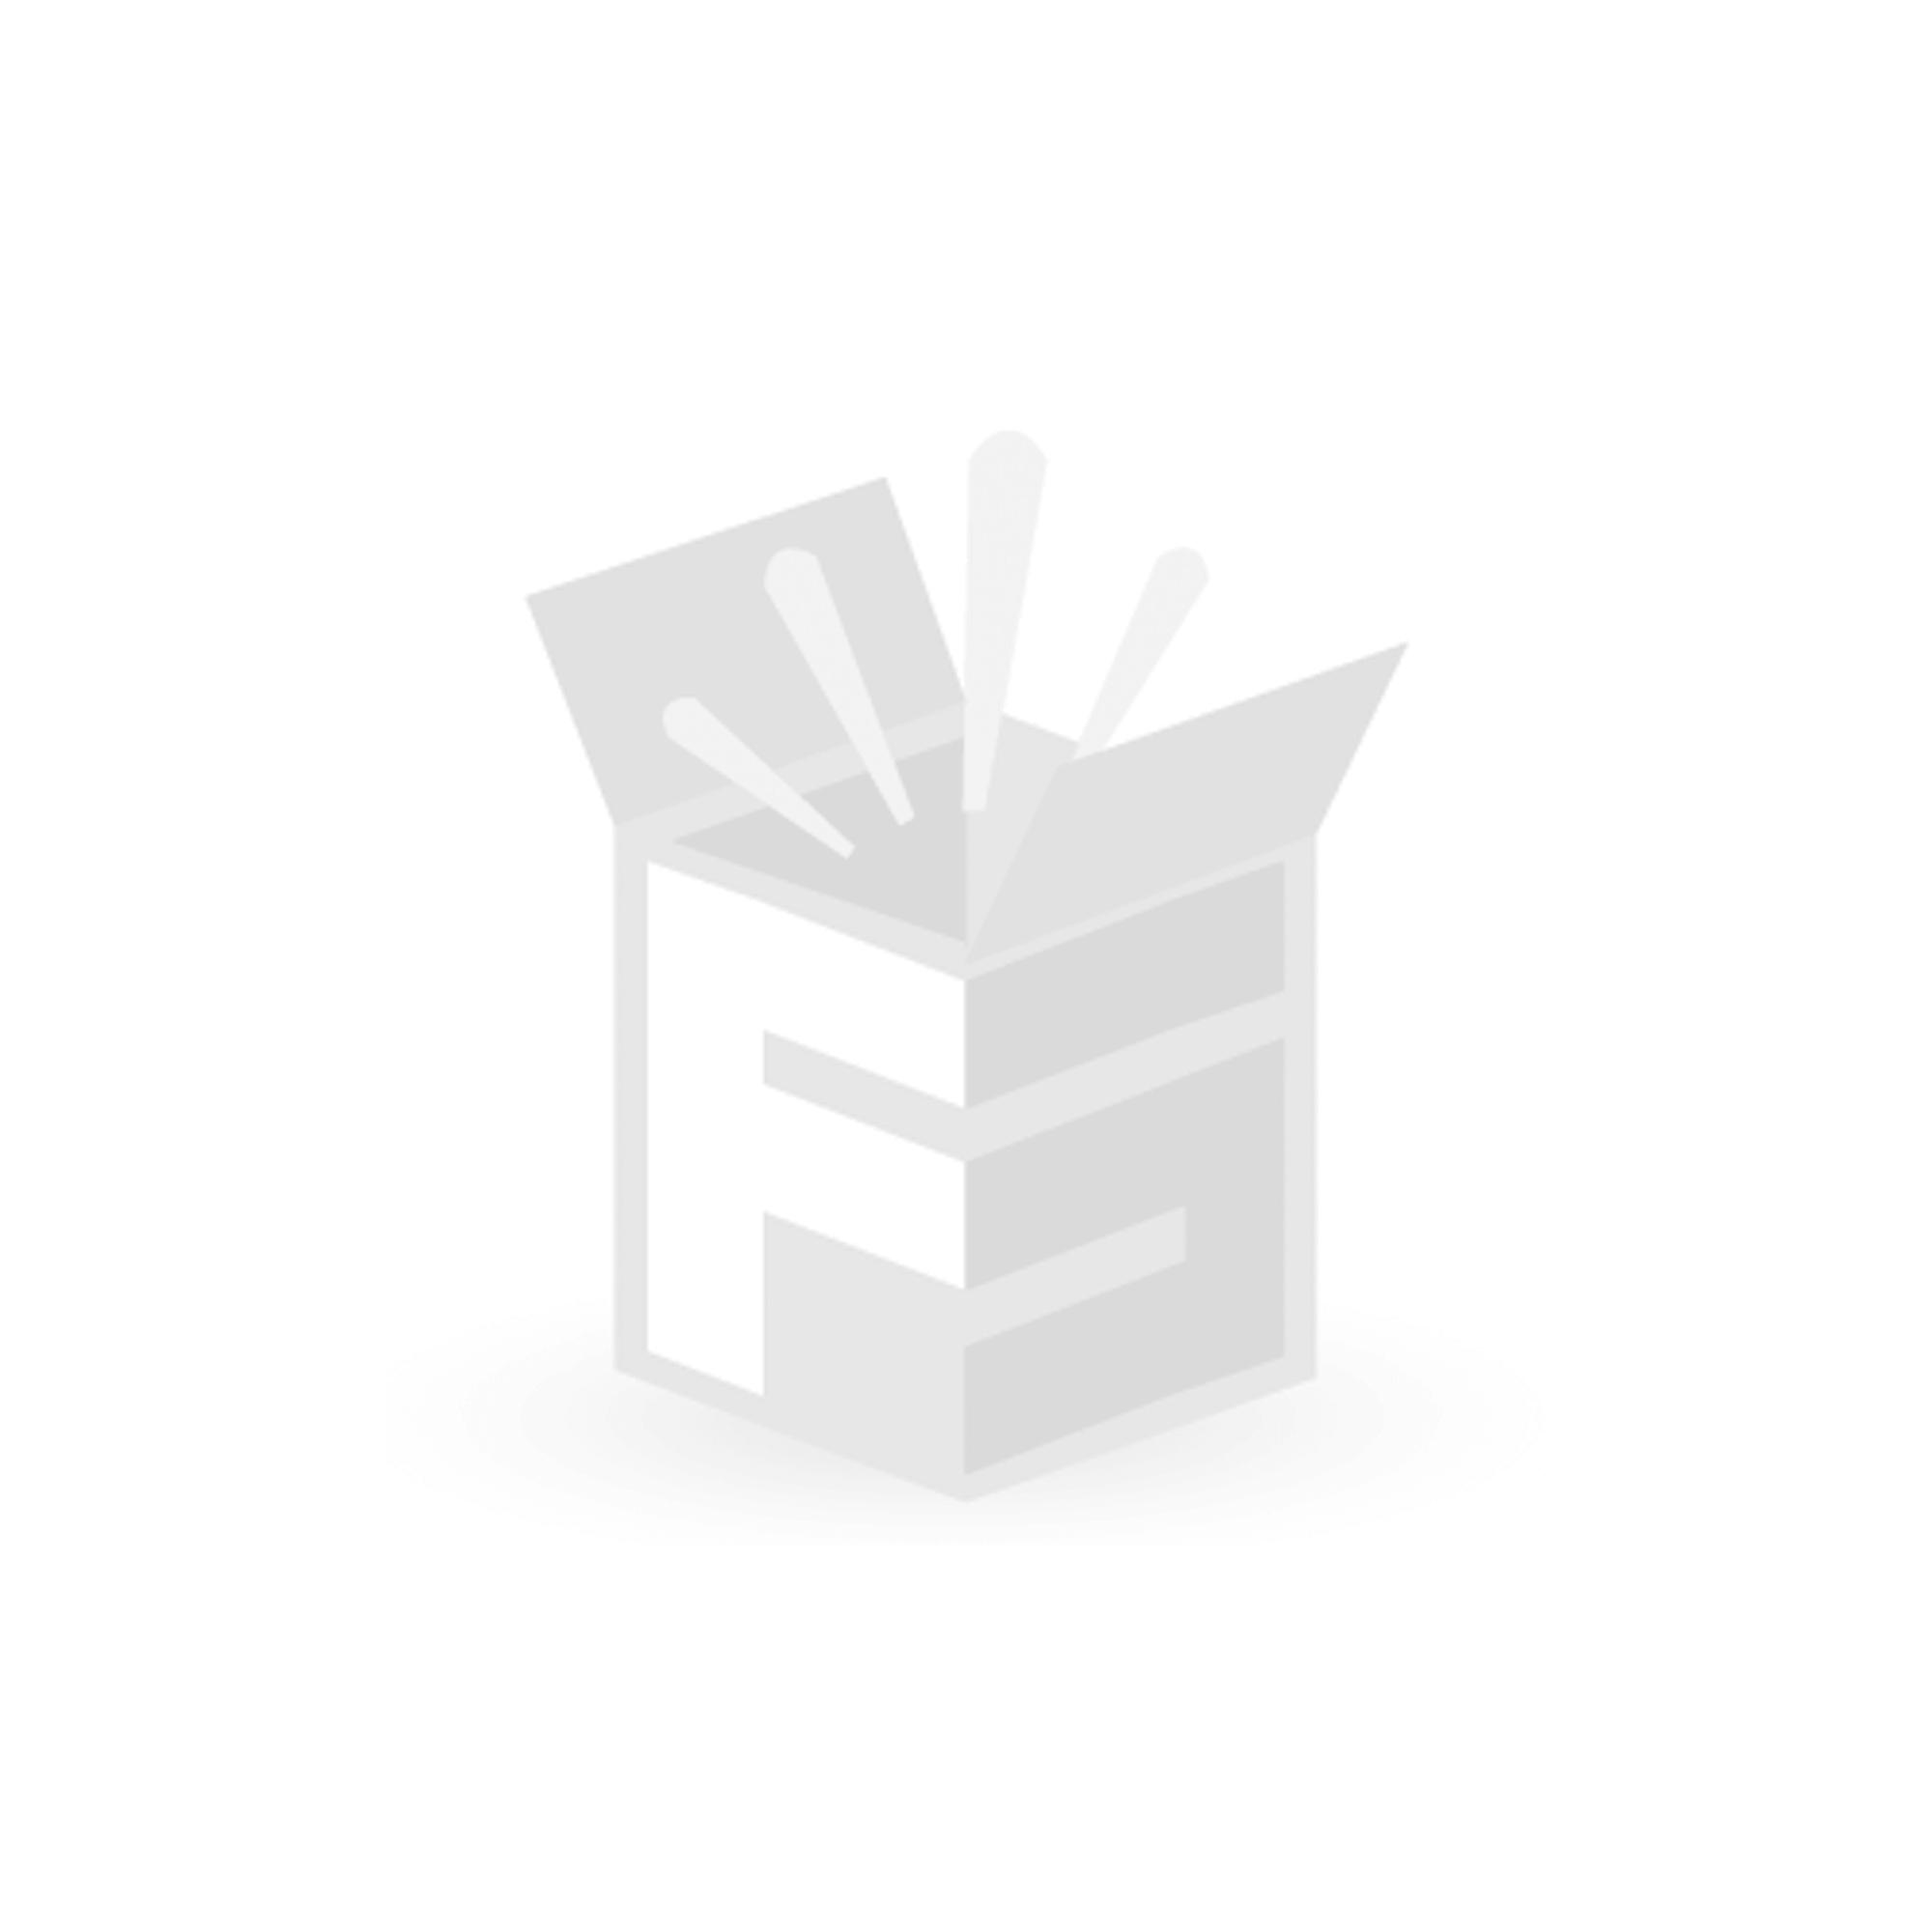 Braun Tondeuse de cheuveux et barbe MultiGroomingKIT MGK 3245 (7dans1)